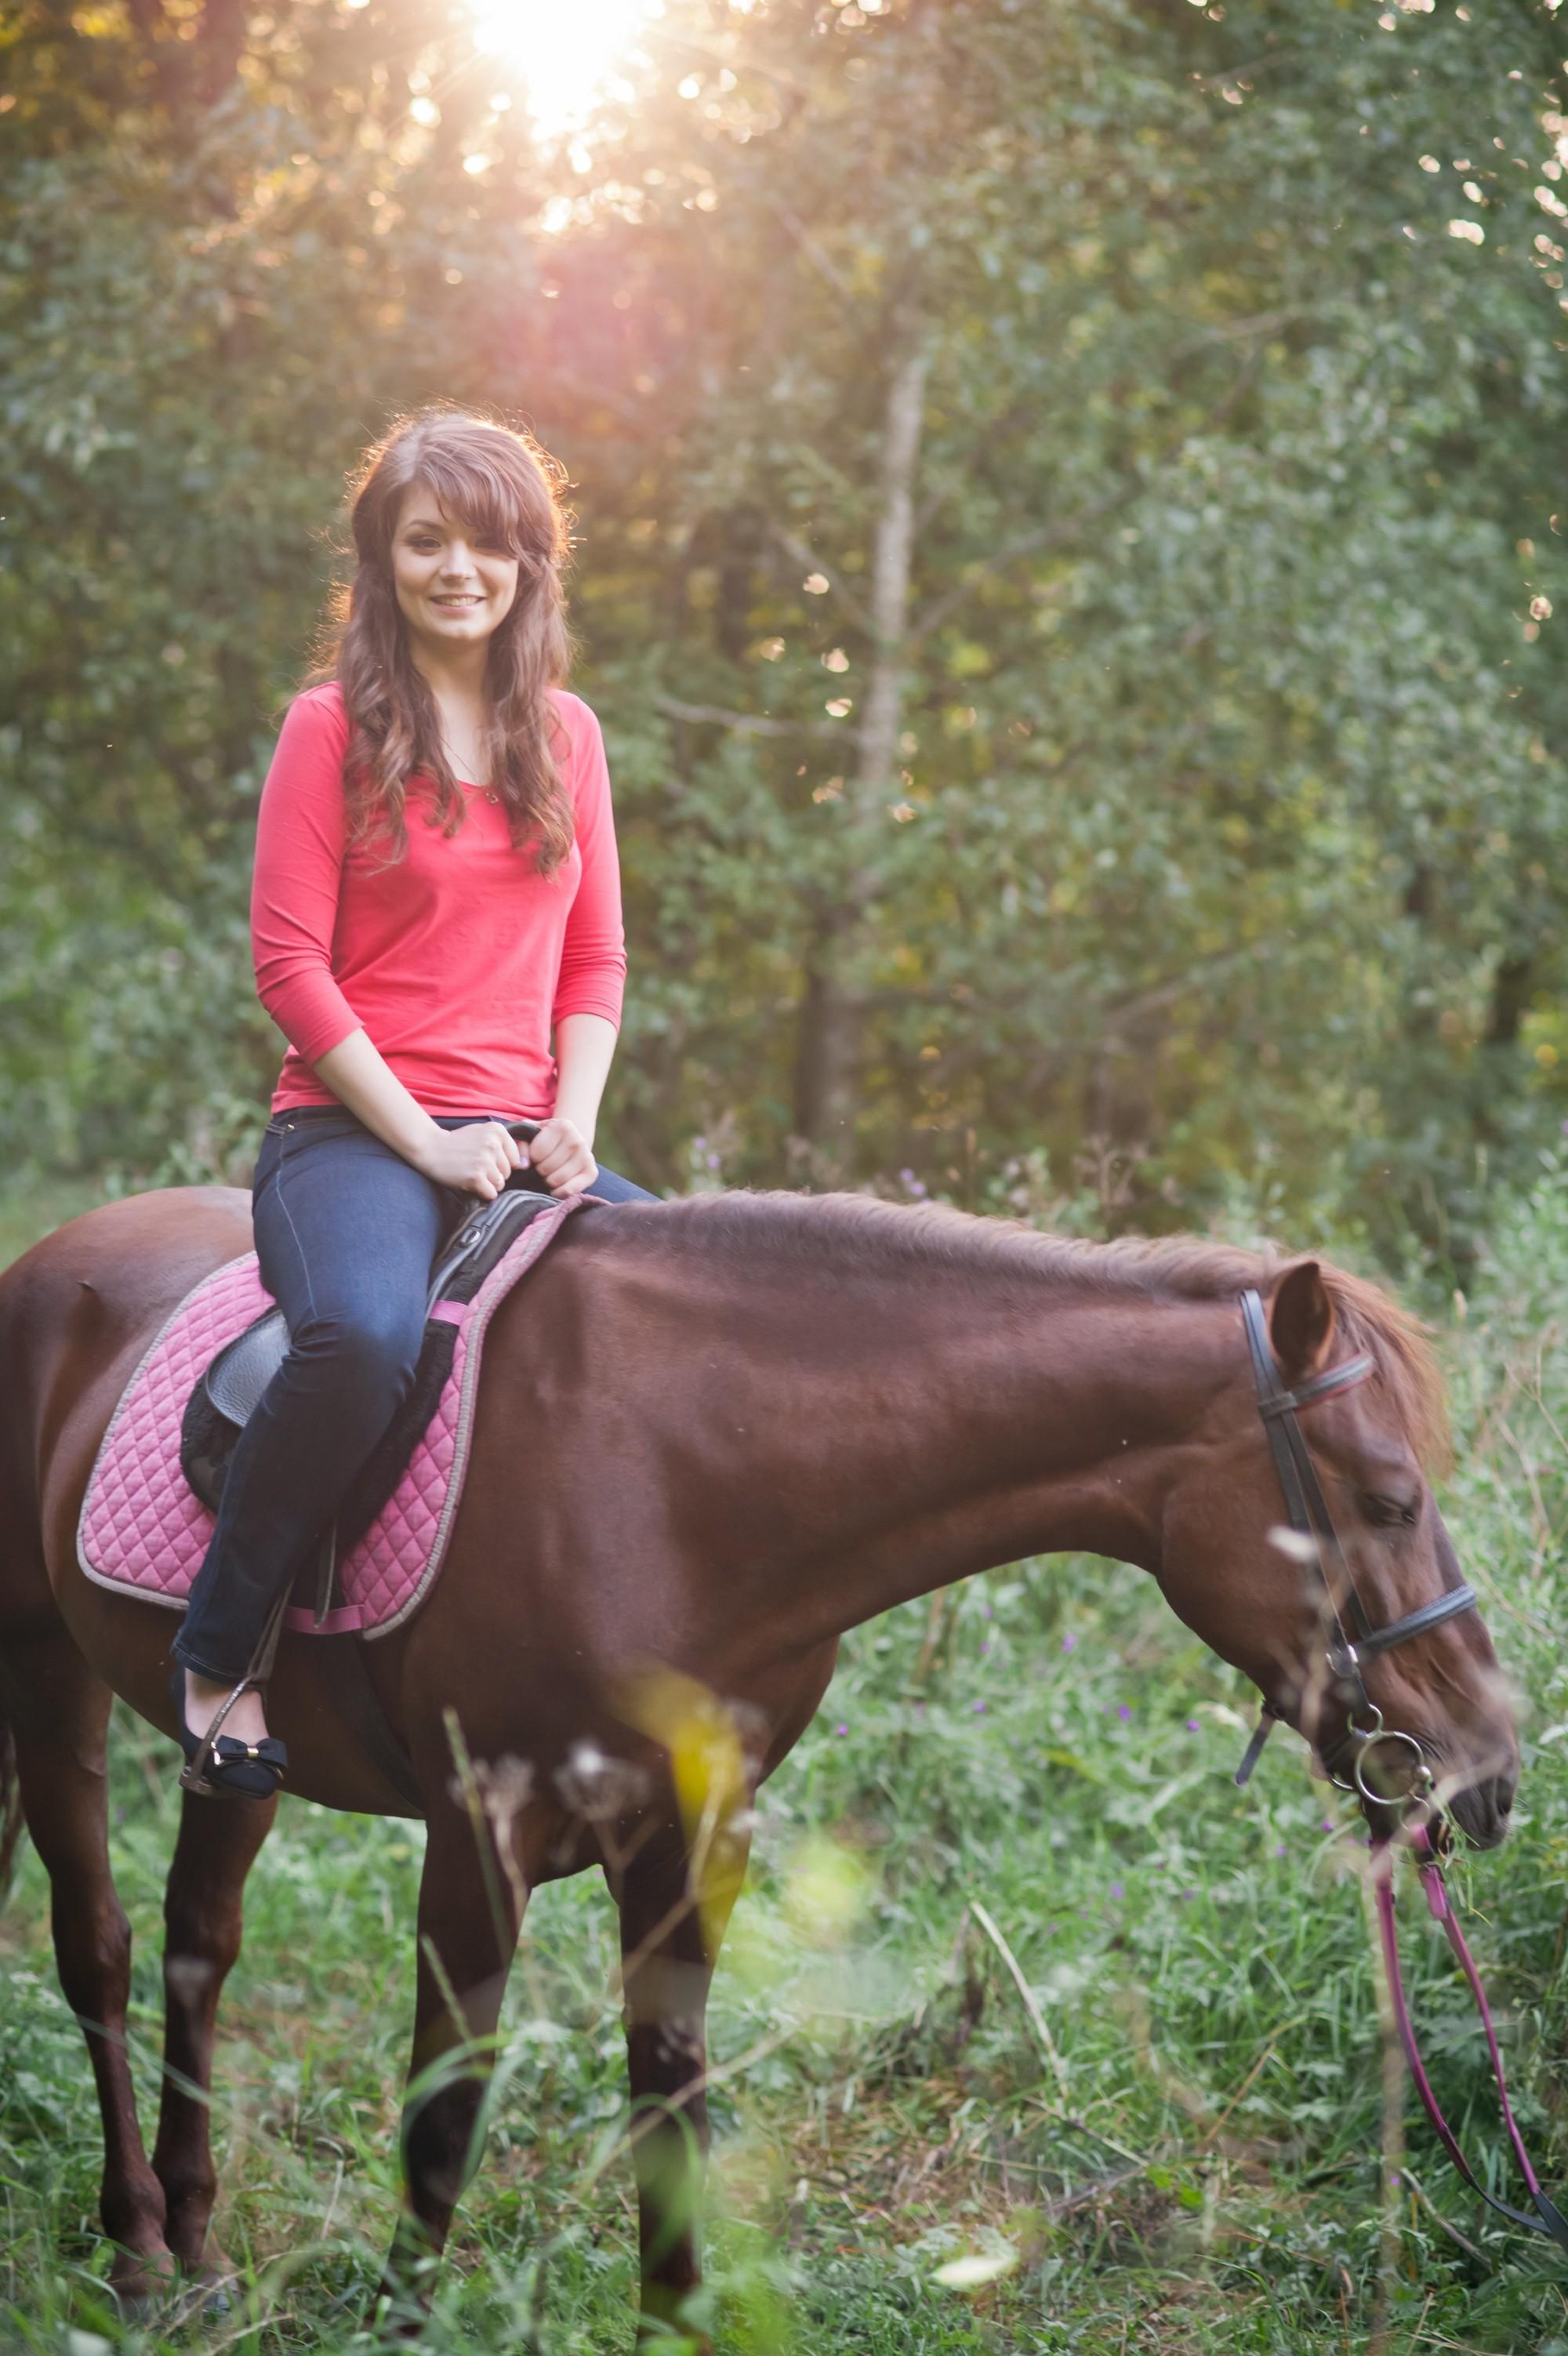 Саша&Илья лавстори на лошадях